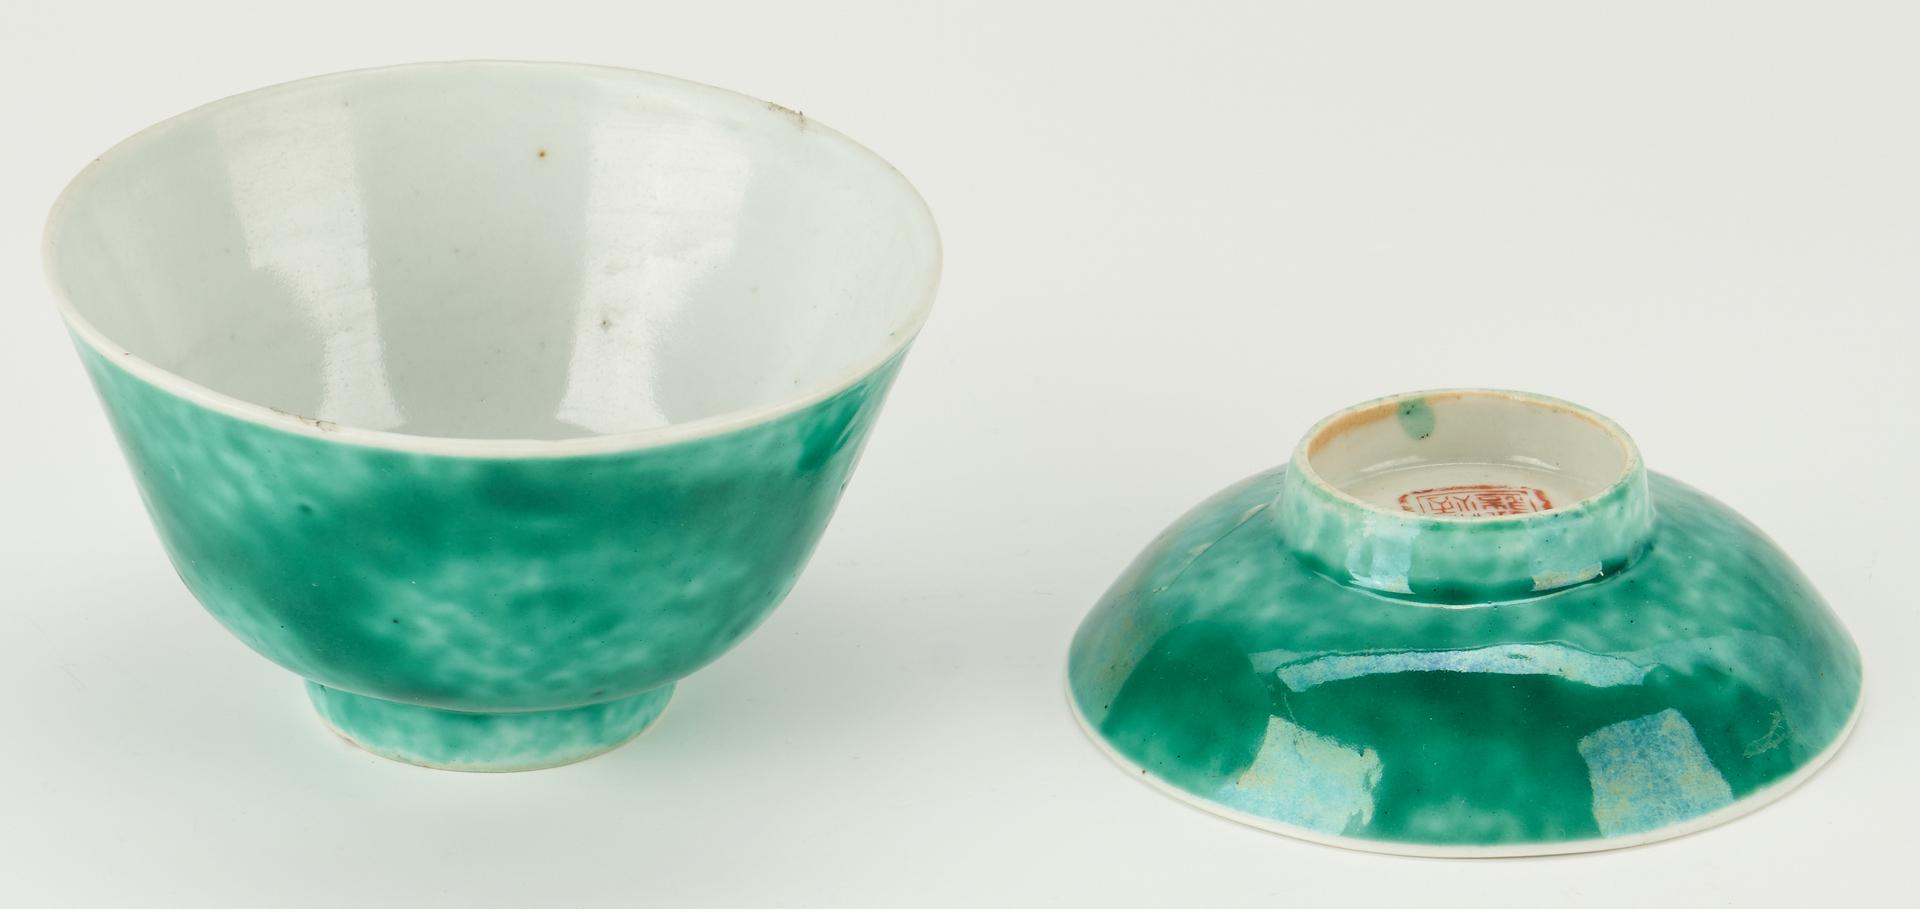 Lot 1094: 3 Chinese Porcelain Items, incl. Tongzhi Bowl